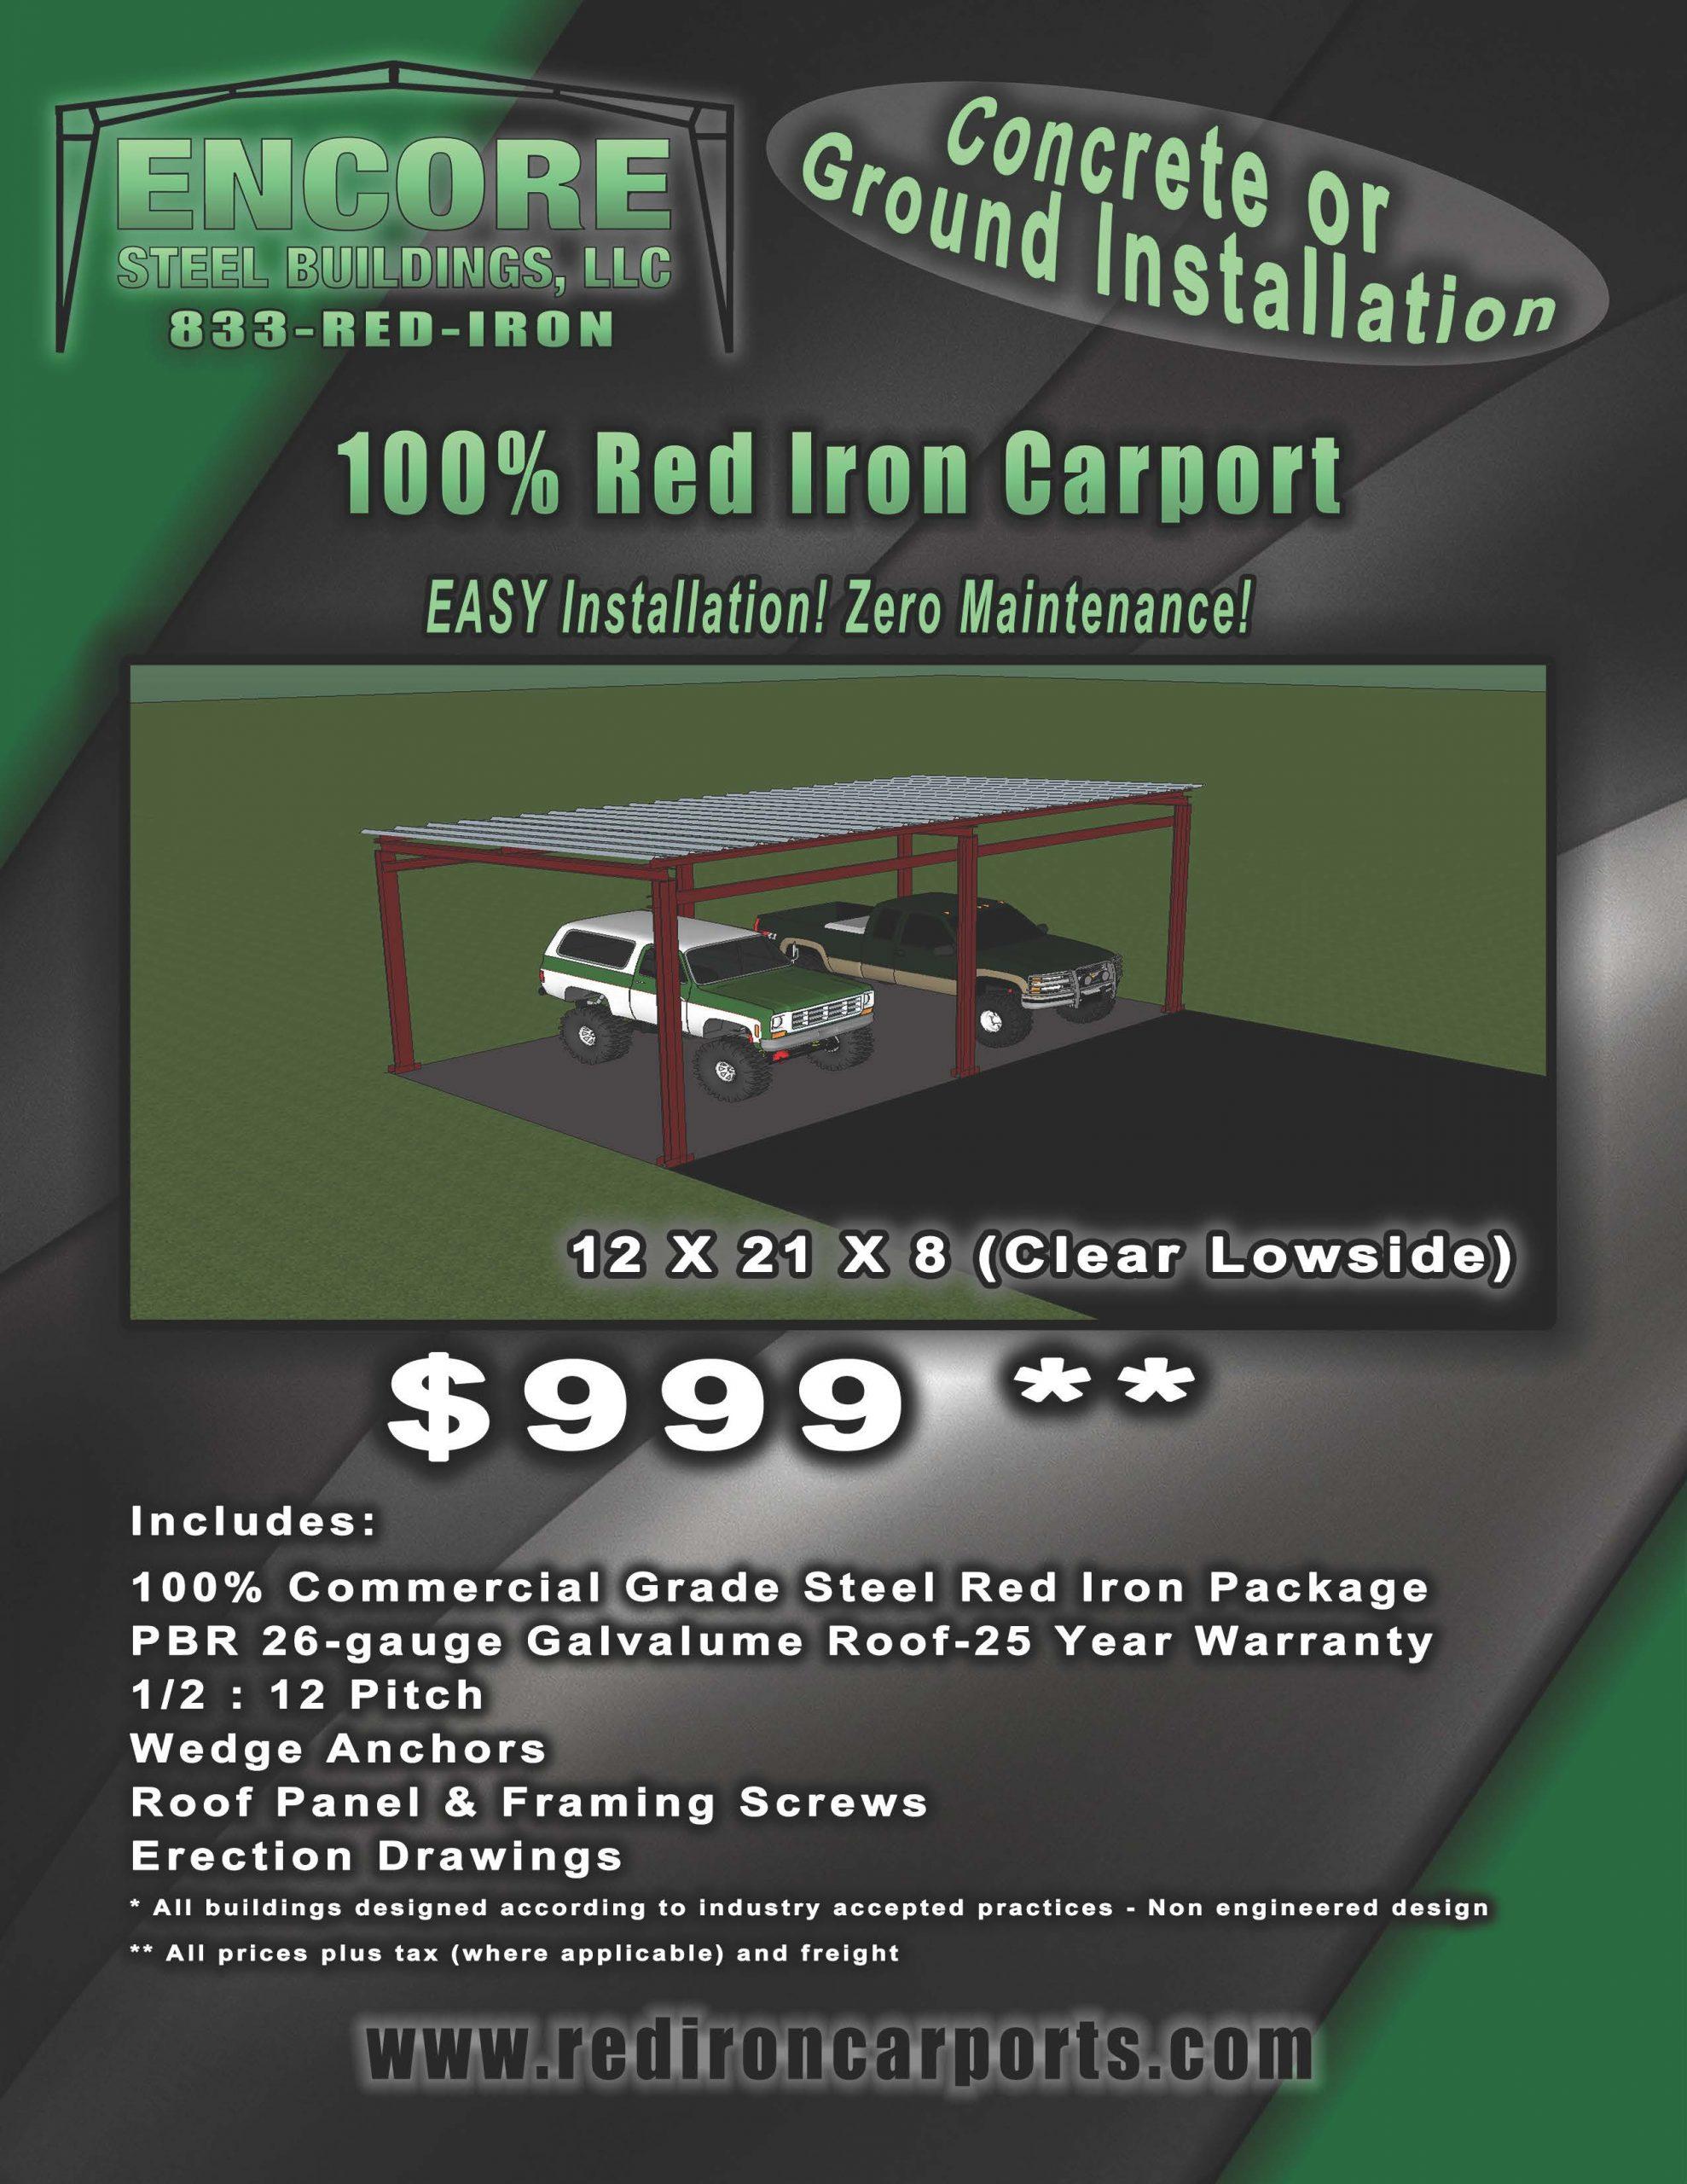 Metal Carport Kits 100 Red Iron Easy Installation And Zero Maintenance